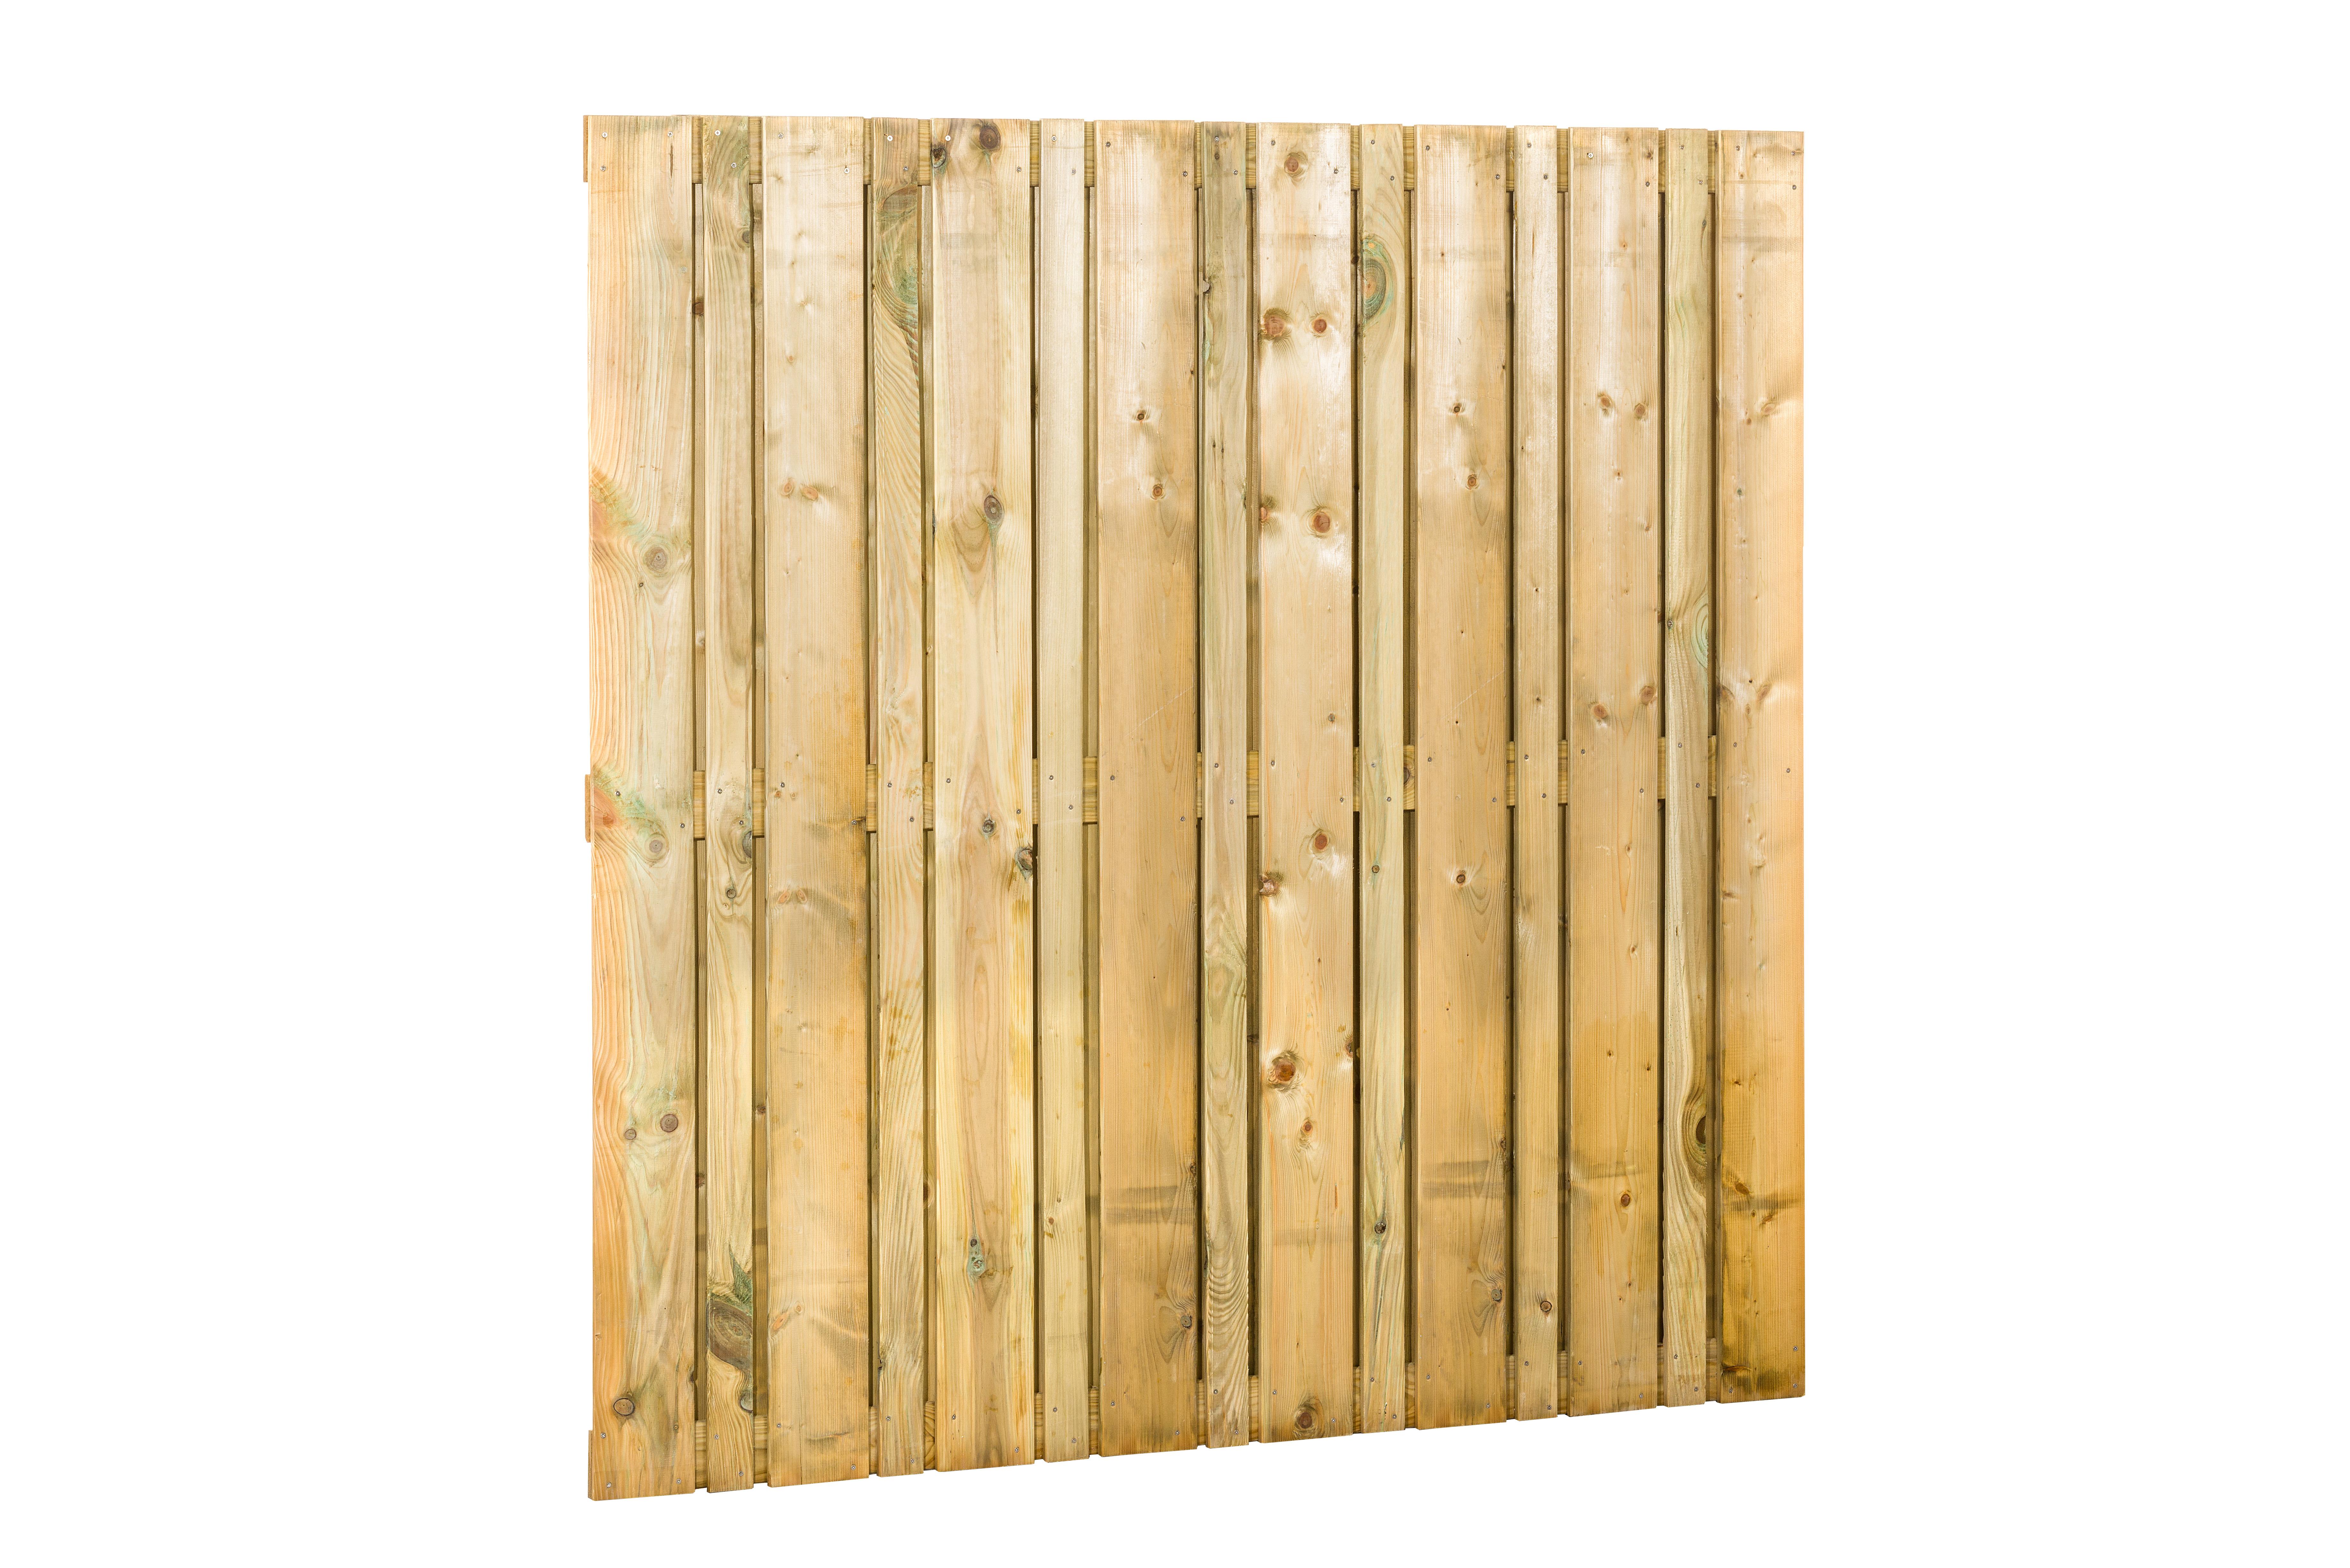 Woodvision   Tuinscherm Linia   180 x 180